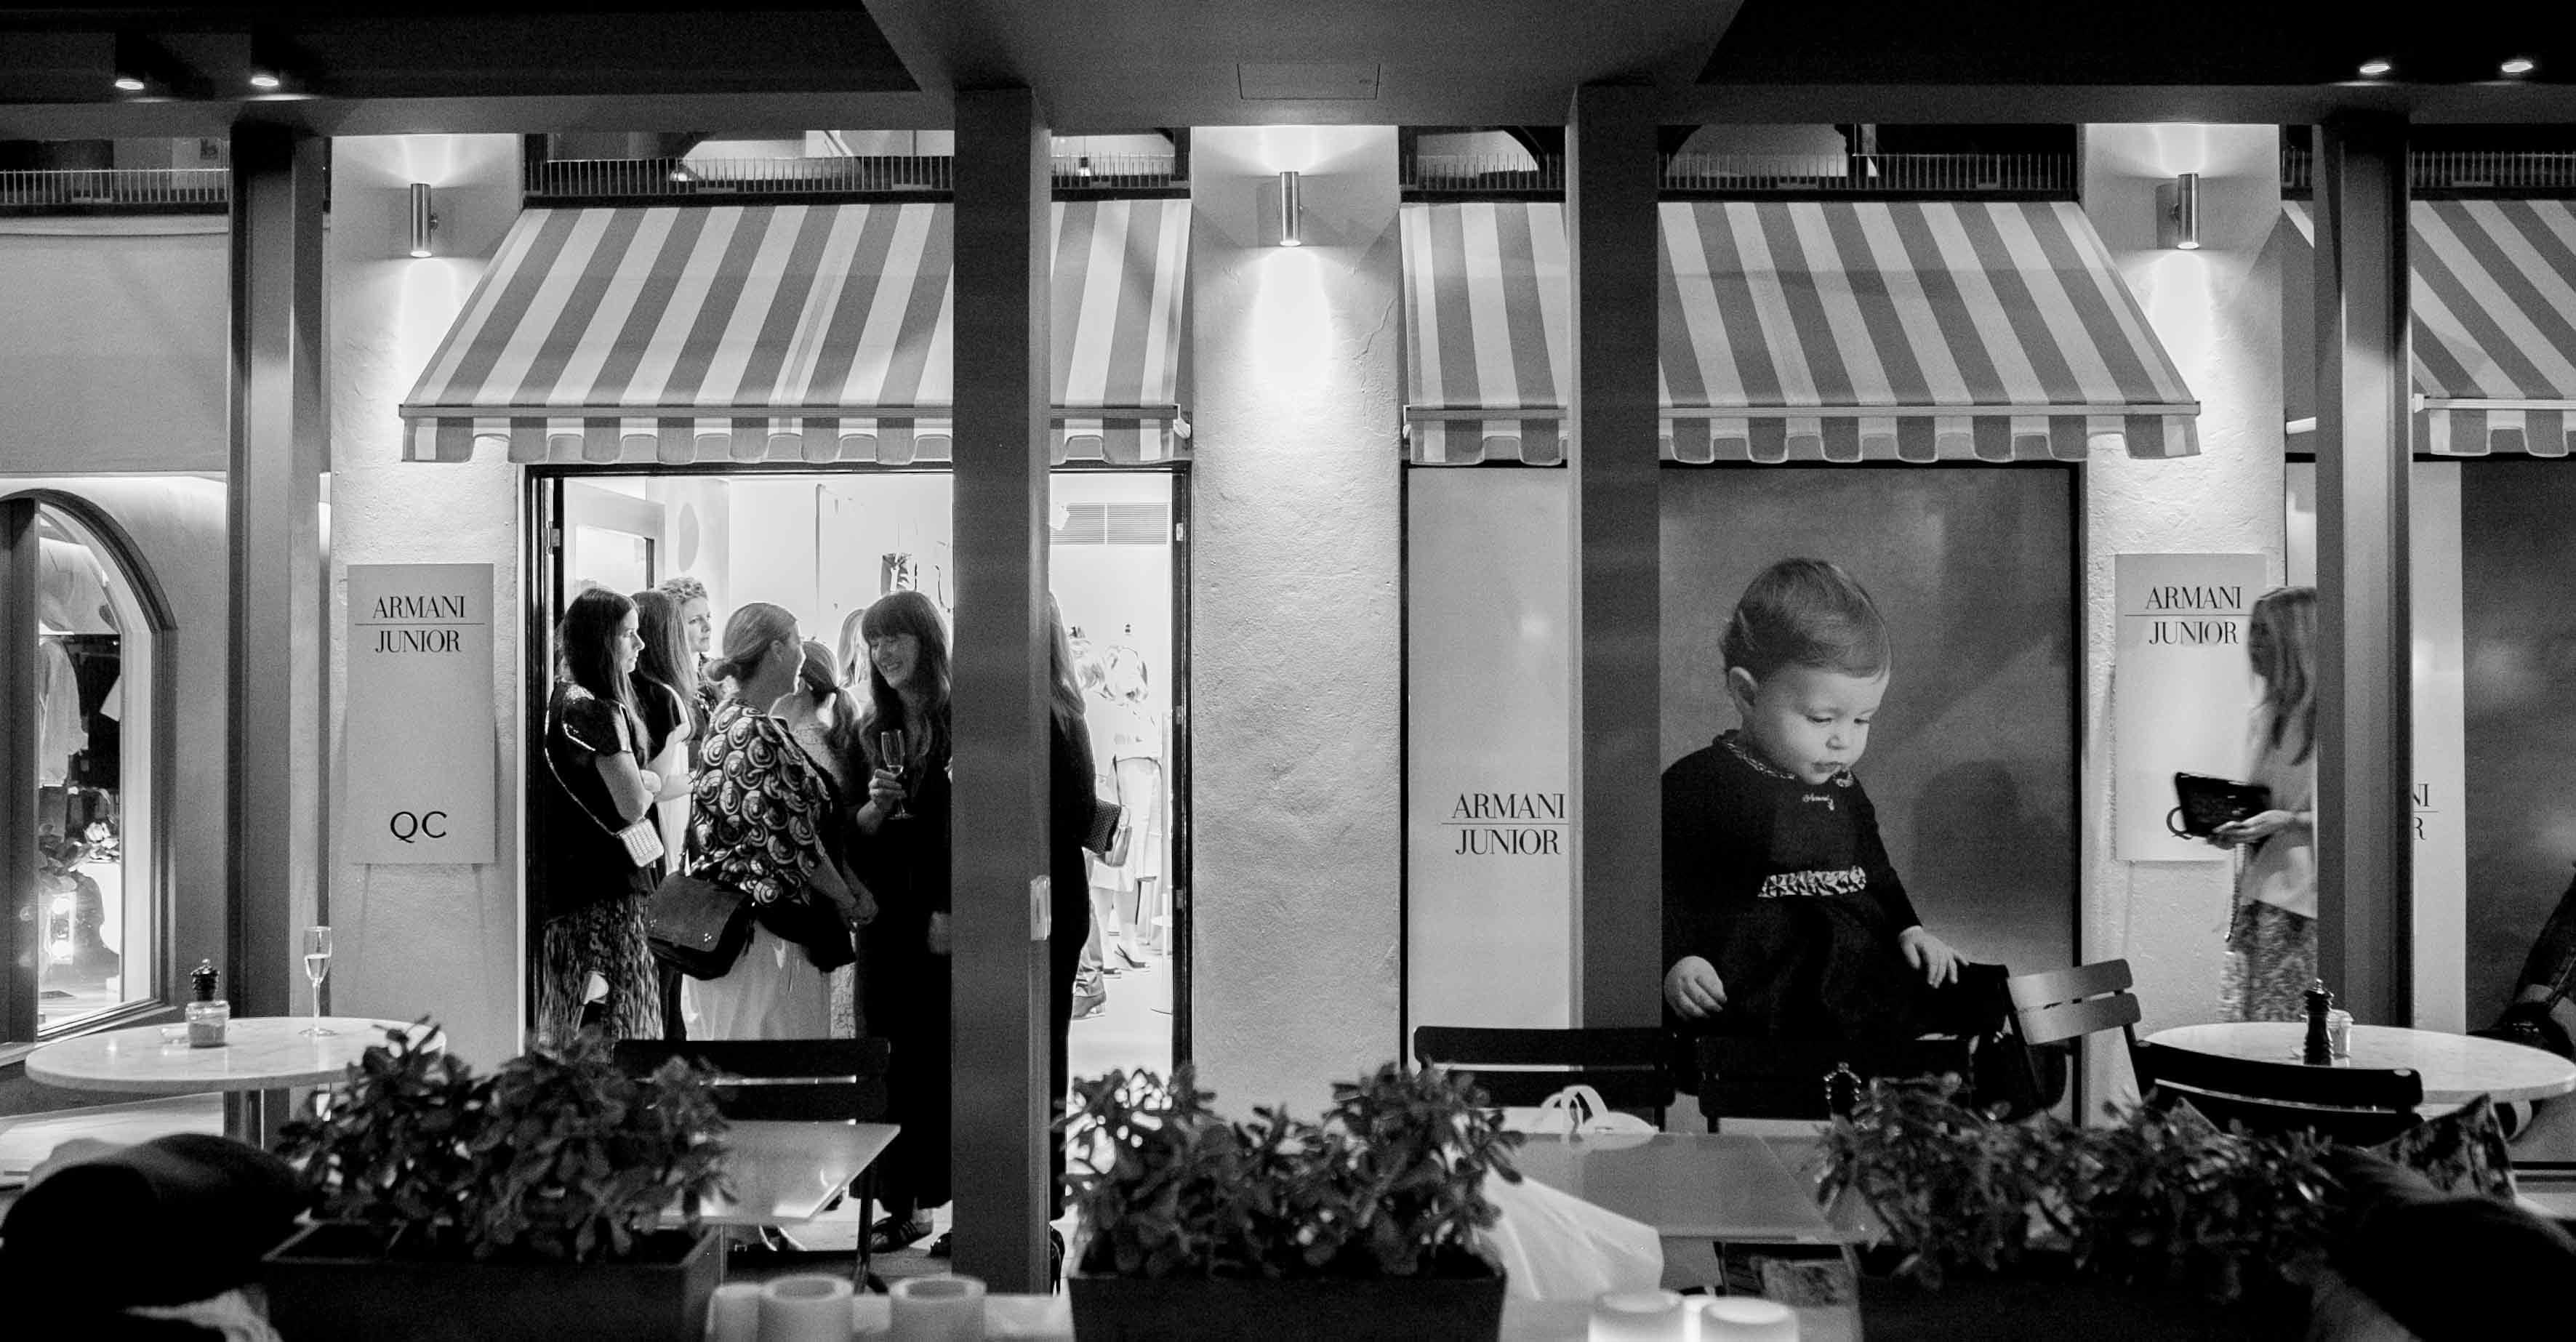 Armani Junior Celebrates A New Sydney Store